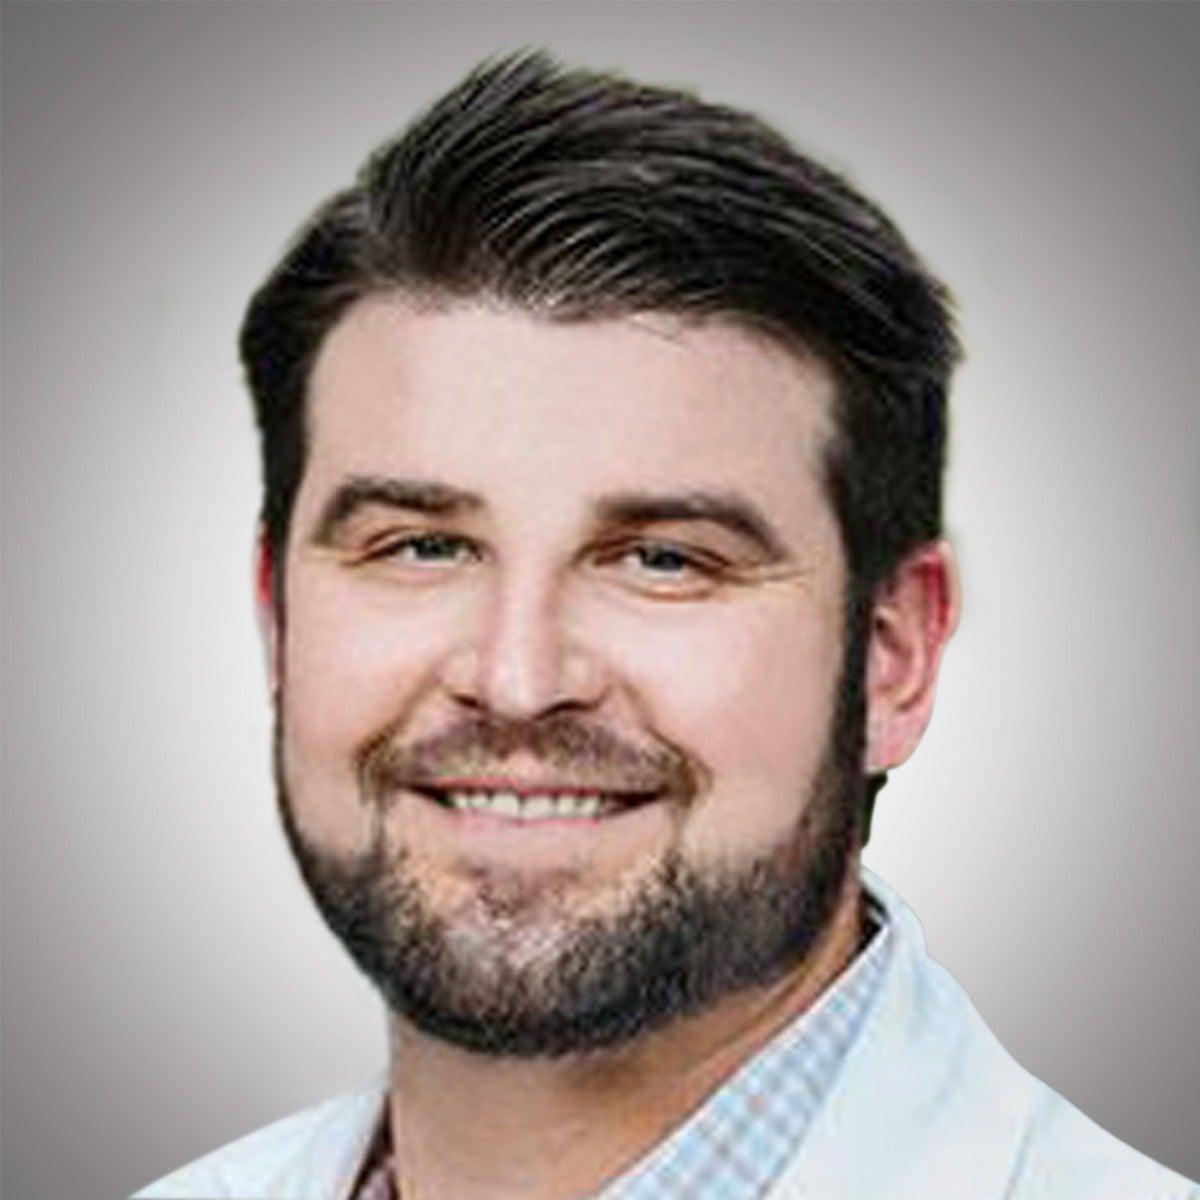 Dental Education Instructor - David L. McAninch IV, DDS